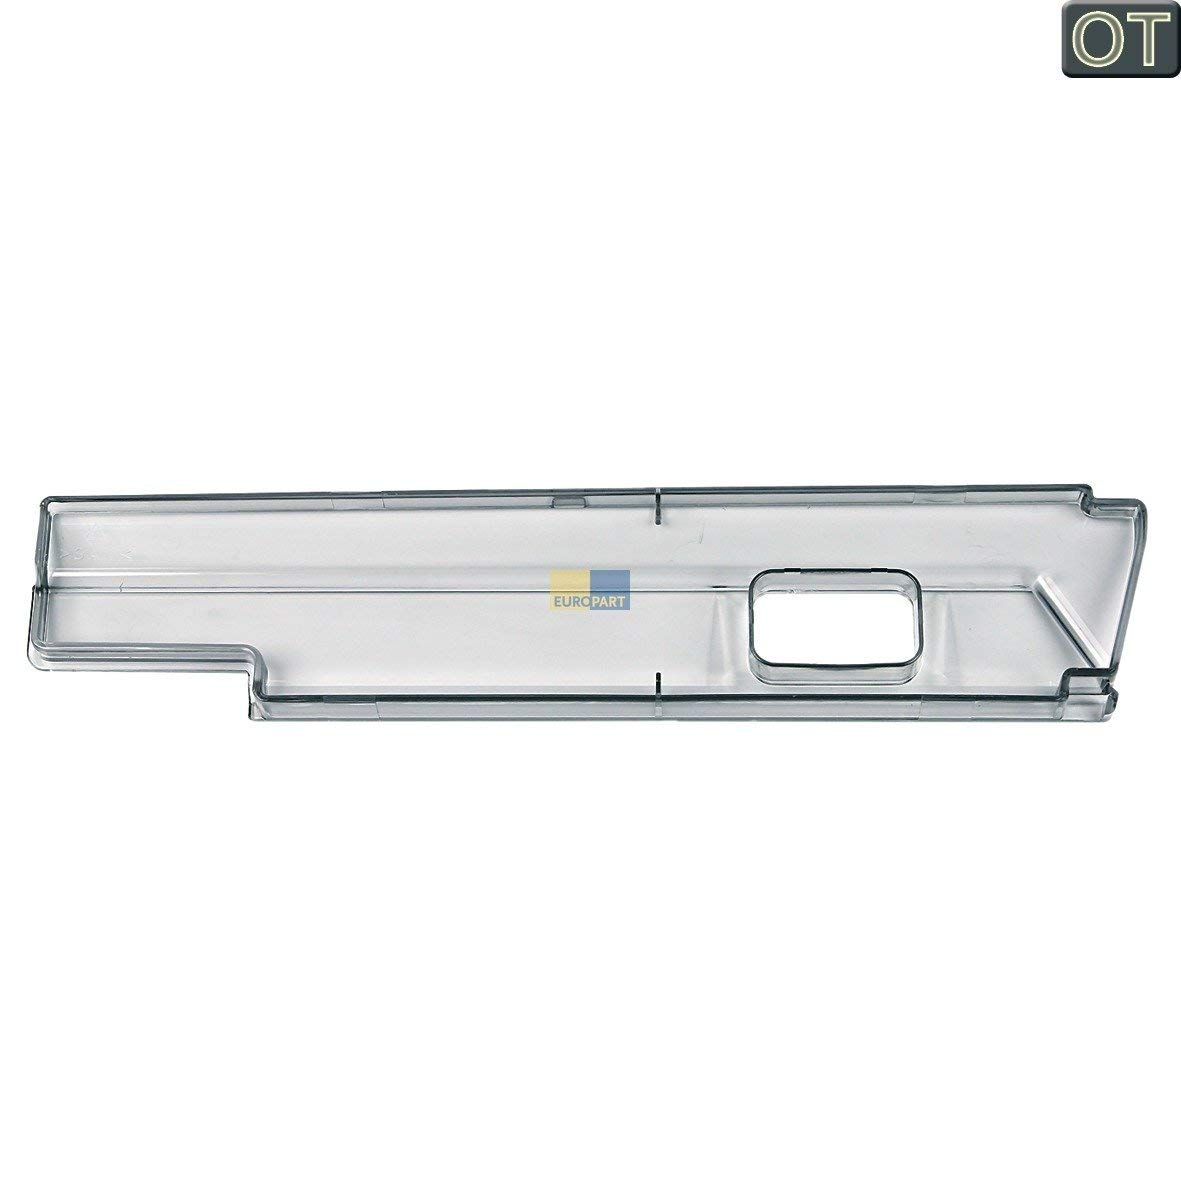 Delonghi 5332145600 Water Tank Cover